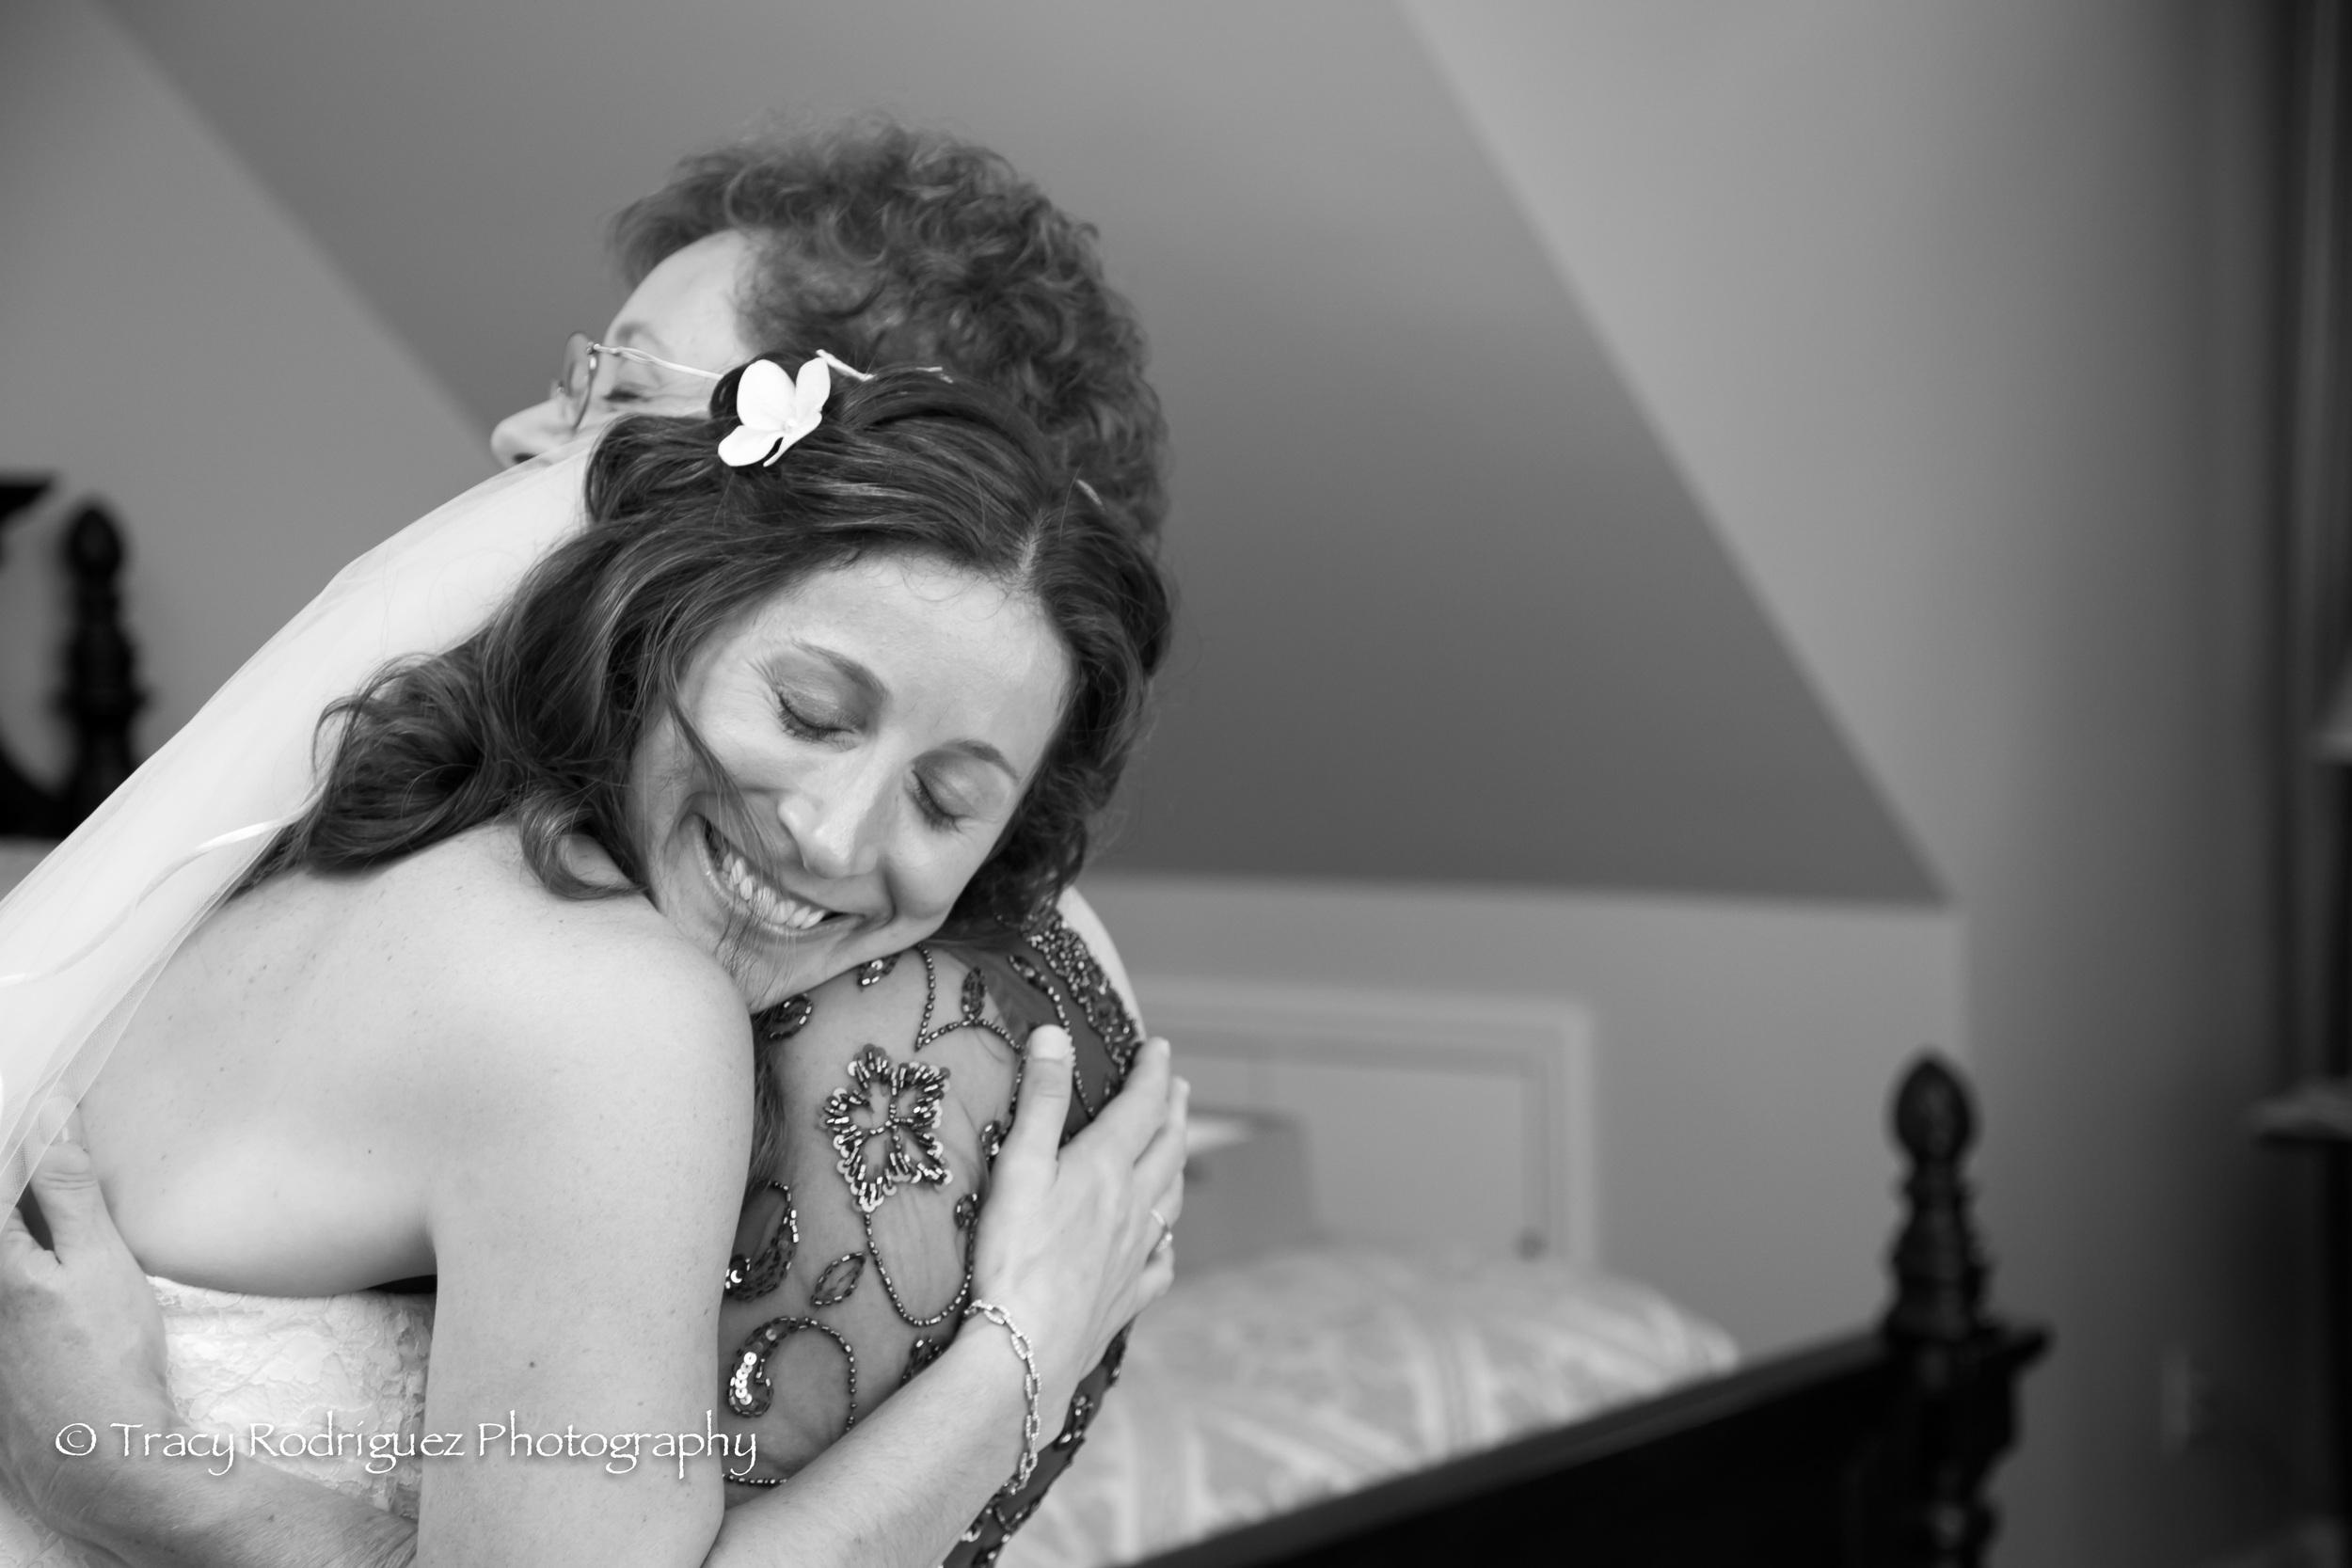 Tracy_Rodriguez_Photography_Blog-1048.jpg